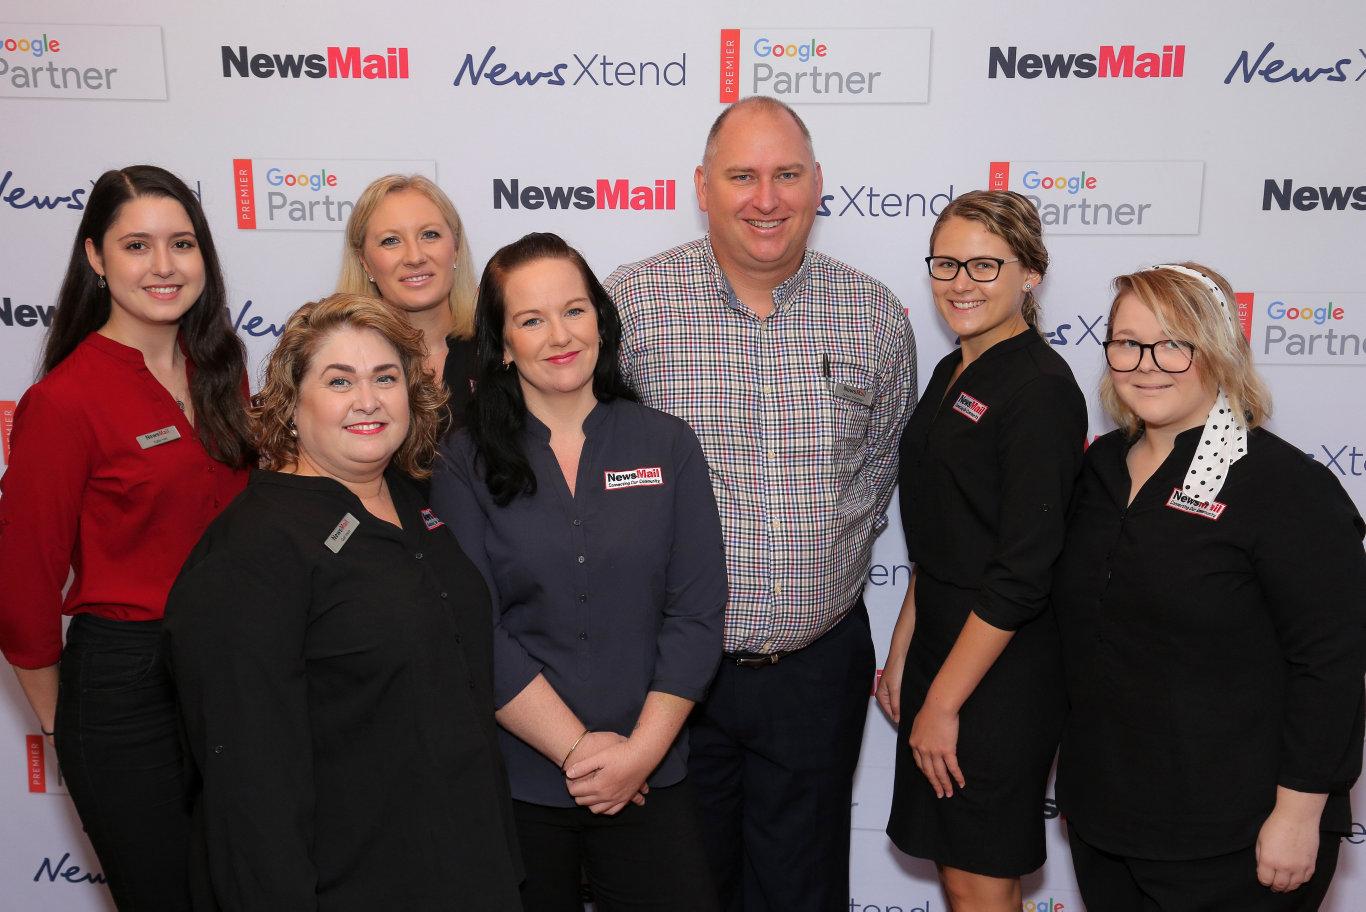 Future Bundaberg: NewsMail's editorial team members Katie Hall, Gail Irwin, Carolyn Booth, Emma Reid, Adam Wratten, Mikayla Haupt and Geordie Offord met with Bundy business owners on Wednesday.